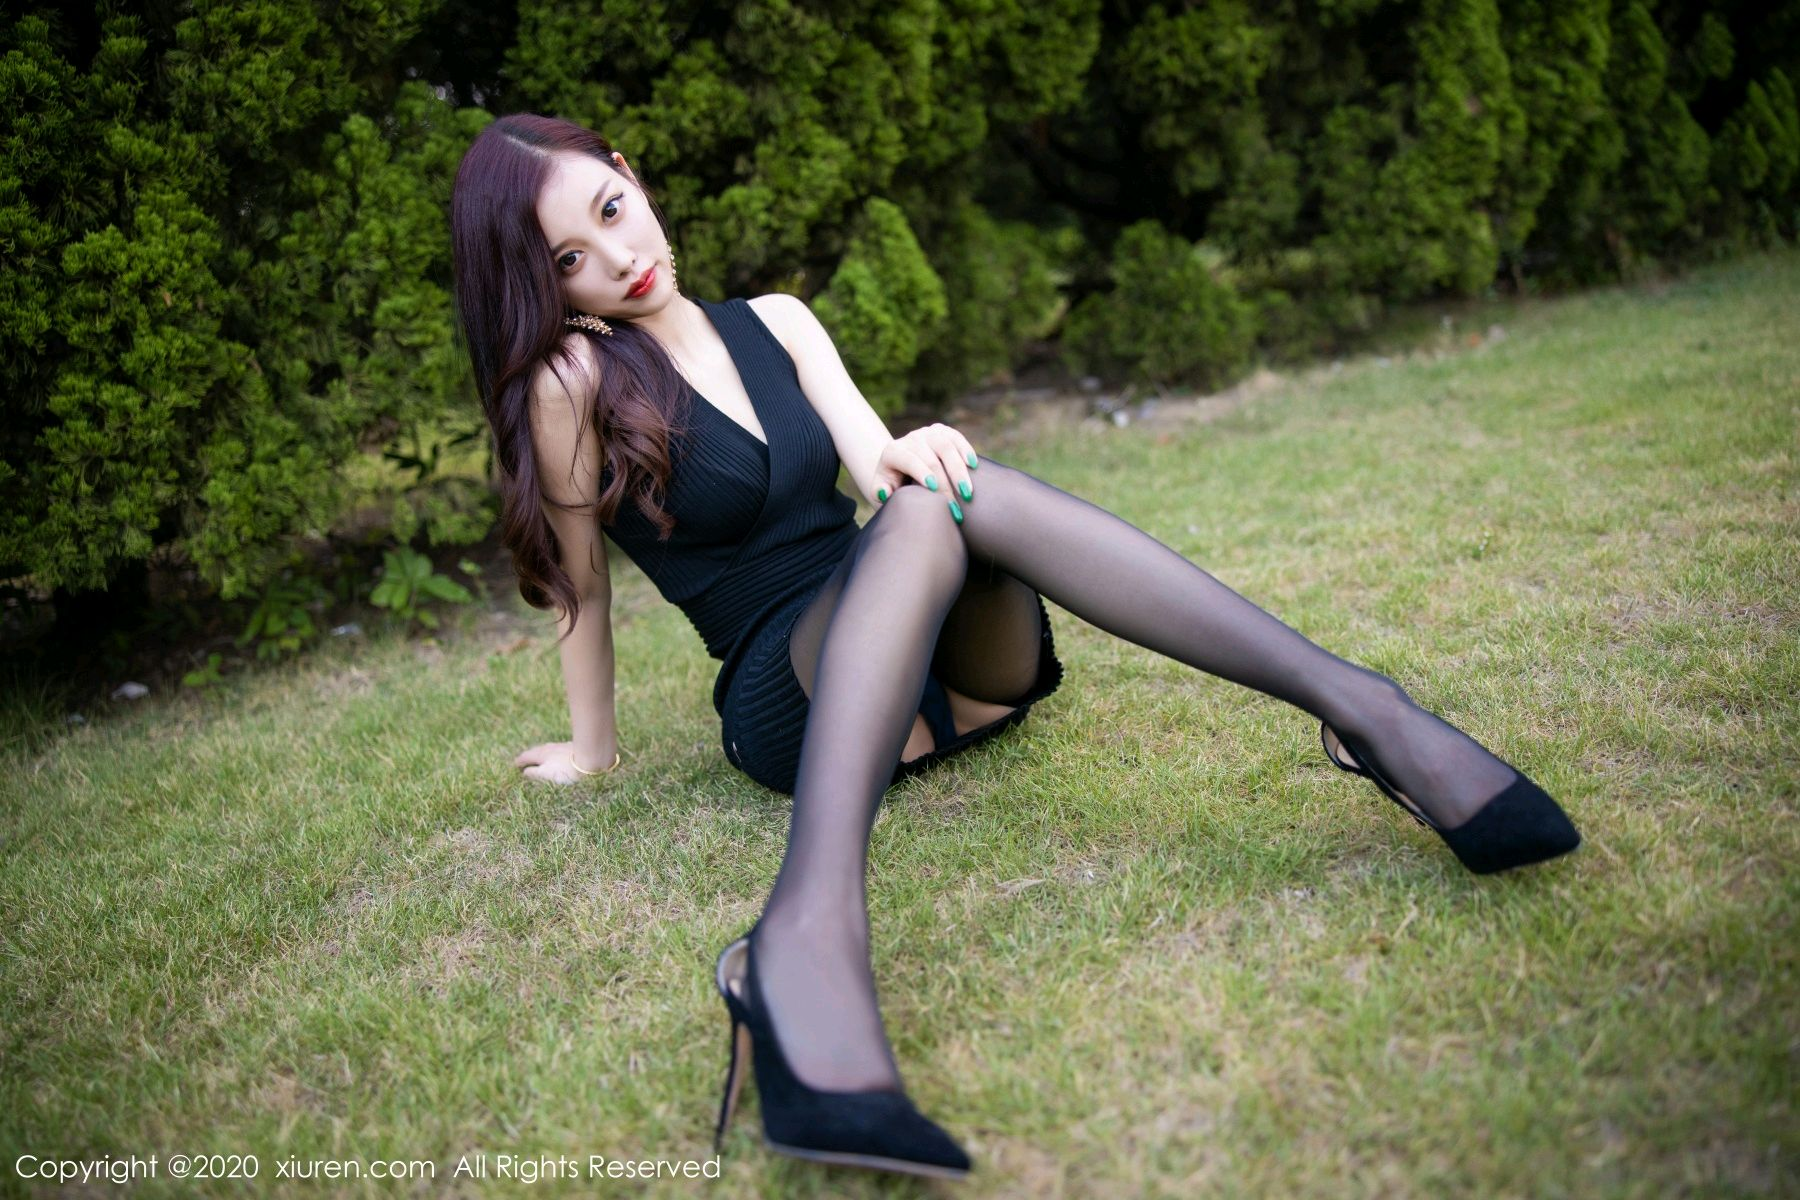 [XiuRen] Vol.2648 Yang Chen Chen 33P, Black Silk, Outdoor, Xiuren, Yang Chen Chen